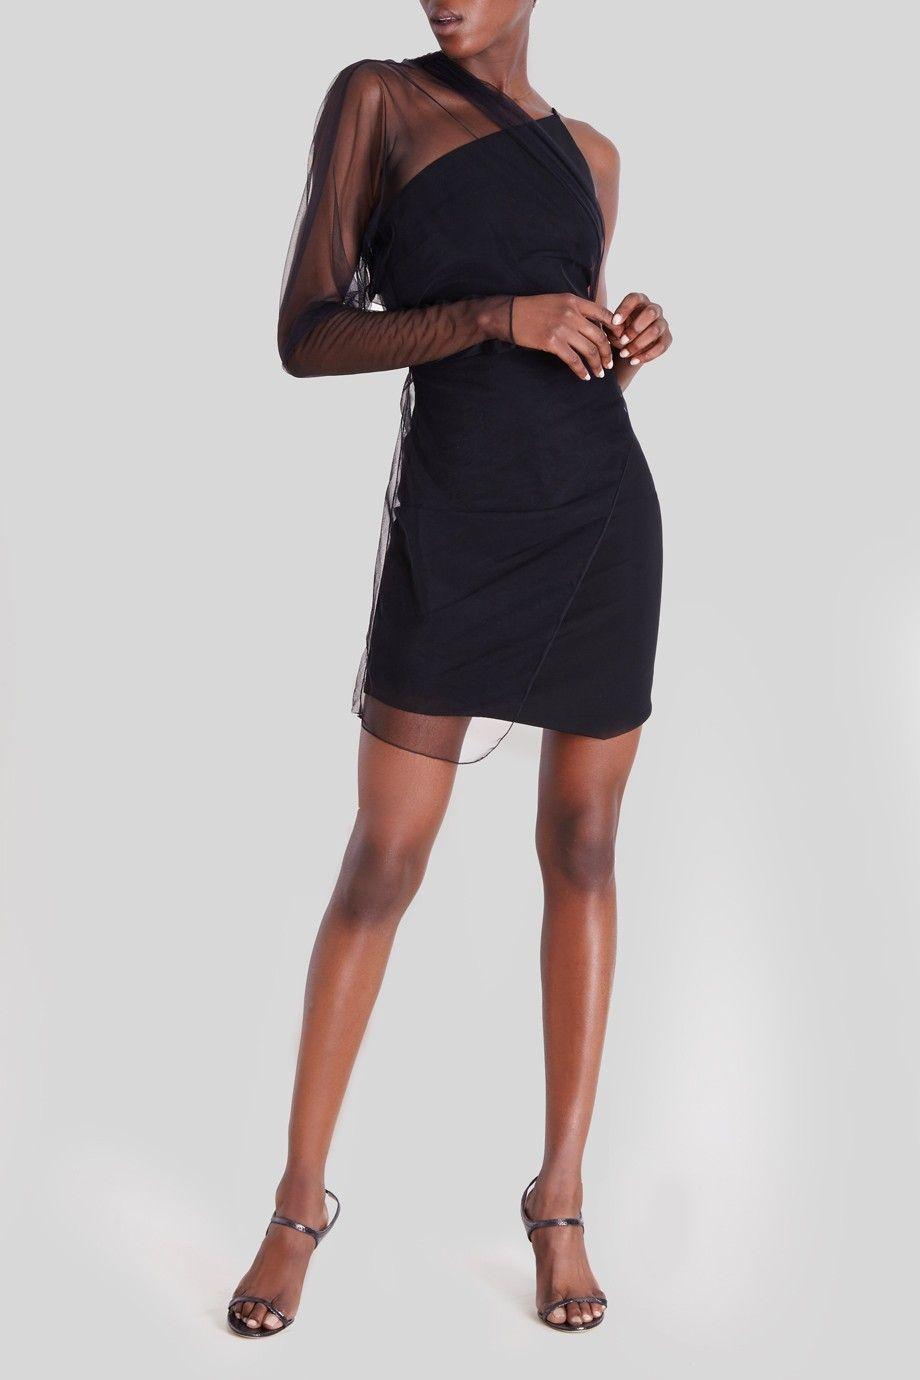 Cushnie Et Ochs Black Hedy Sheer Overlay Mini Dress What S New Little Black Dress Dresses Mini Dress [ 1380 x 920 Pixel ]